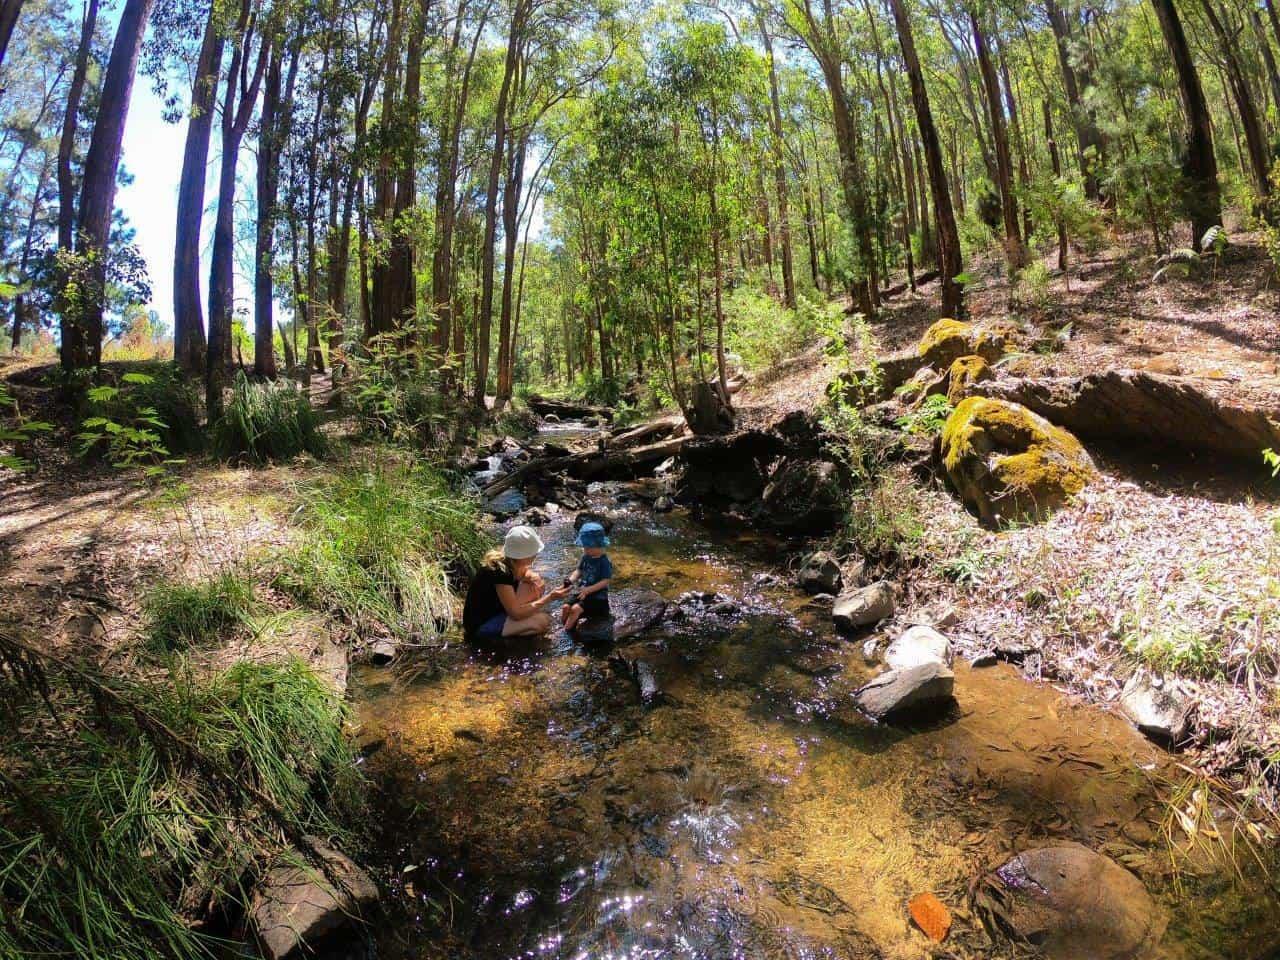 Enjoying the creeks